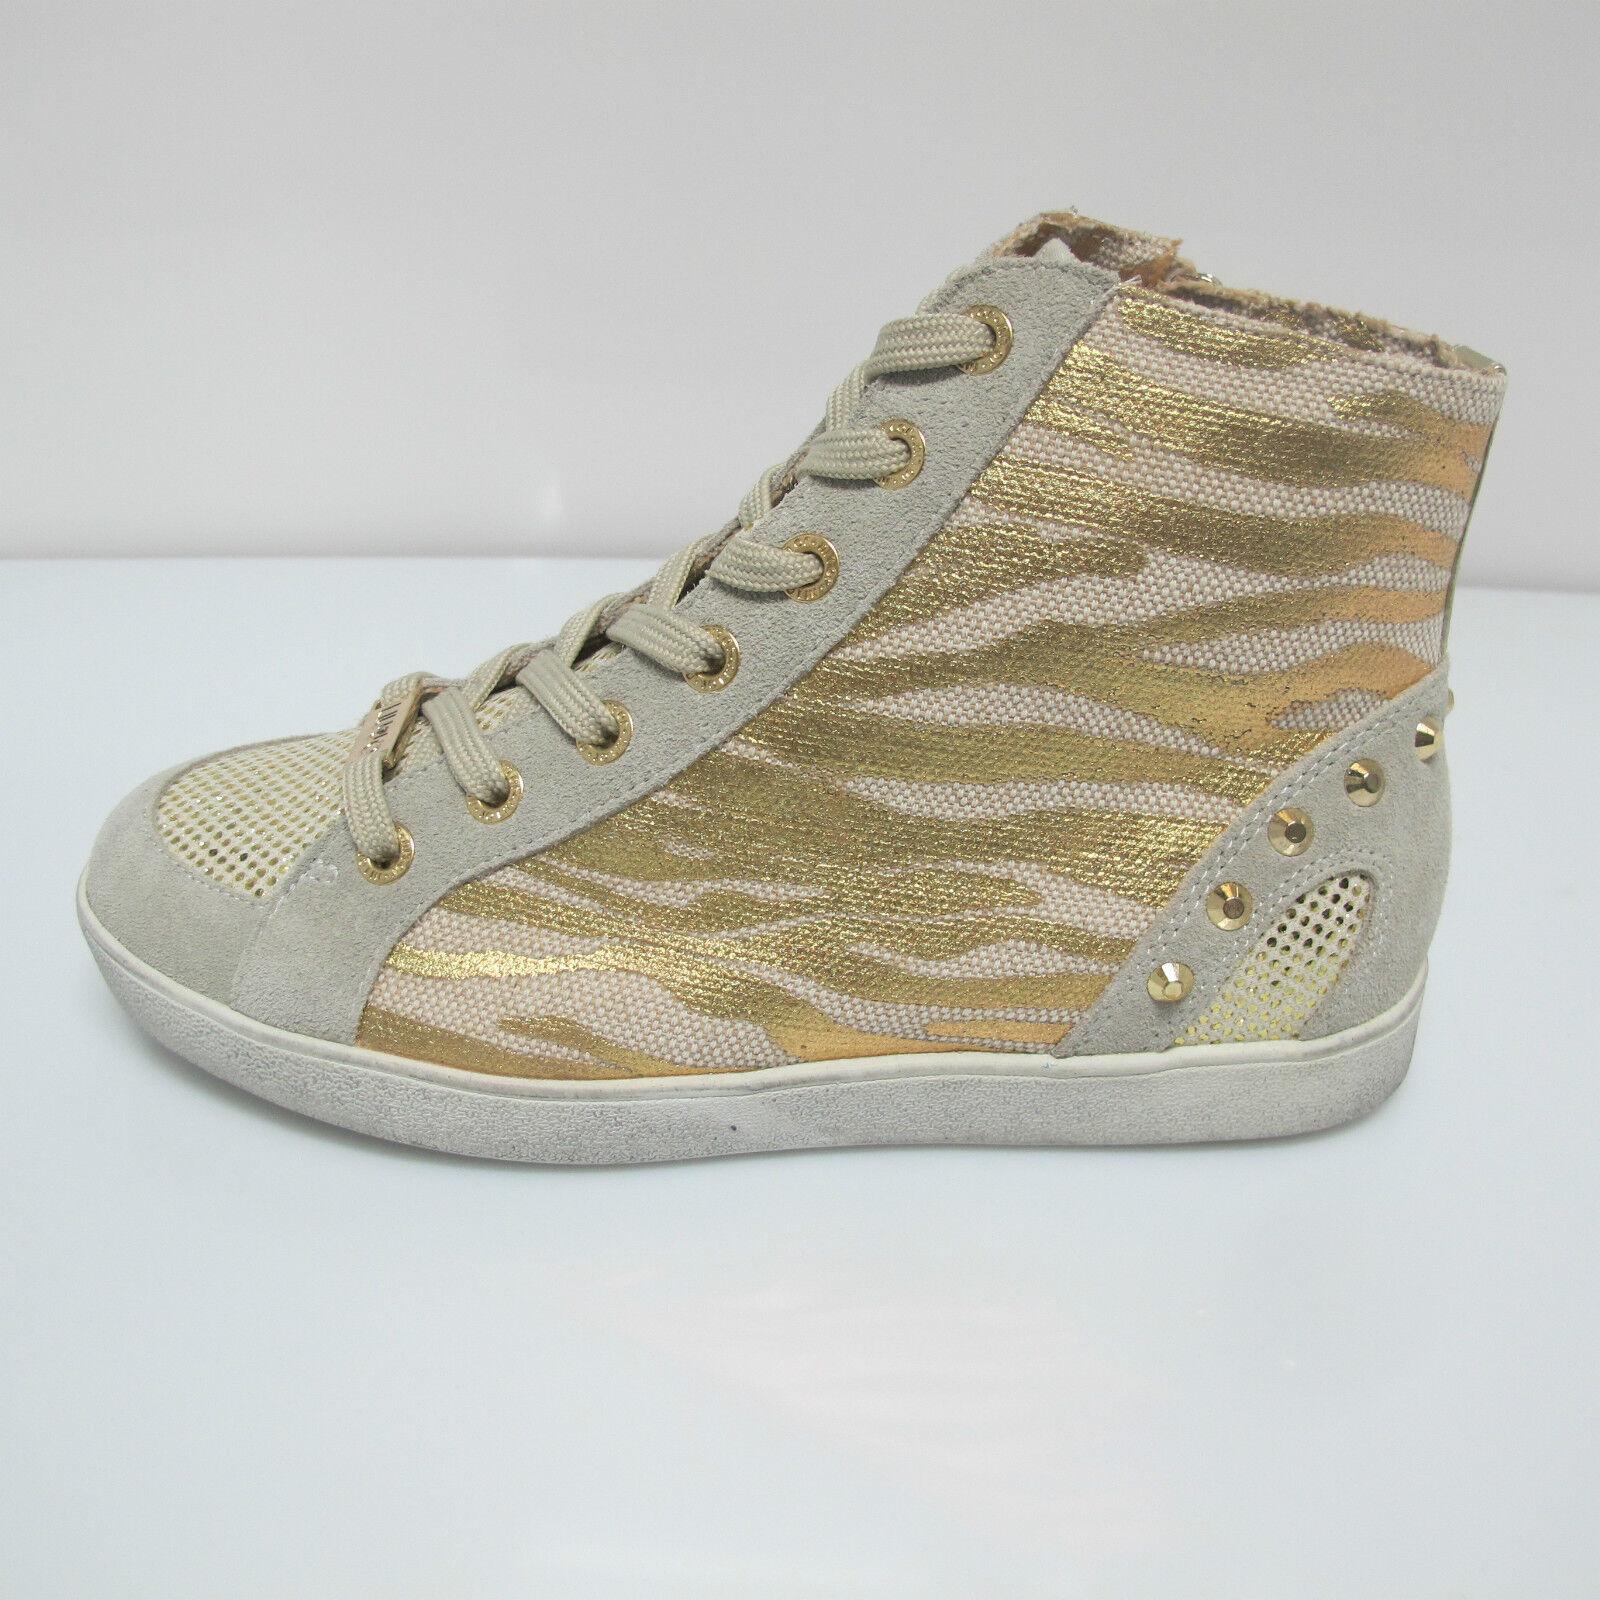 LIU JO zapatos de mujer ZAPATILLAS alto mod.EVA S15145 T8024 col. BEIGE oro